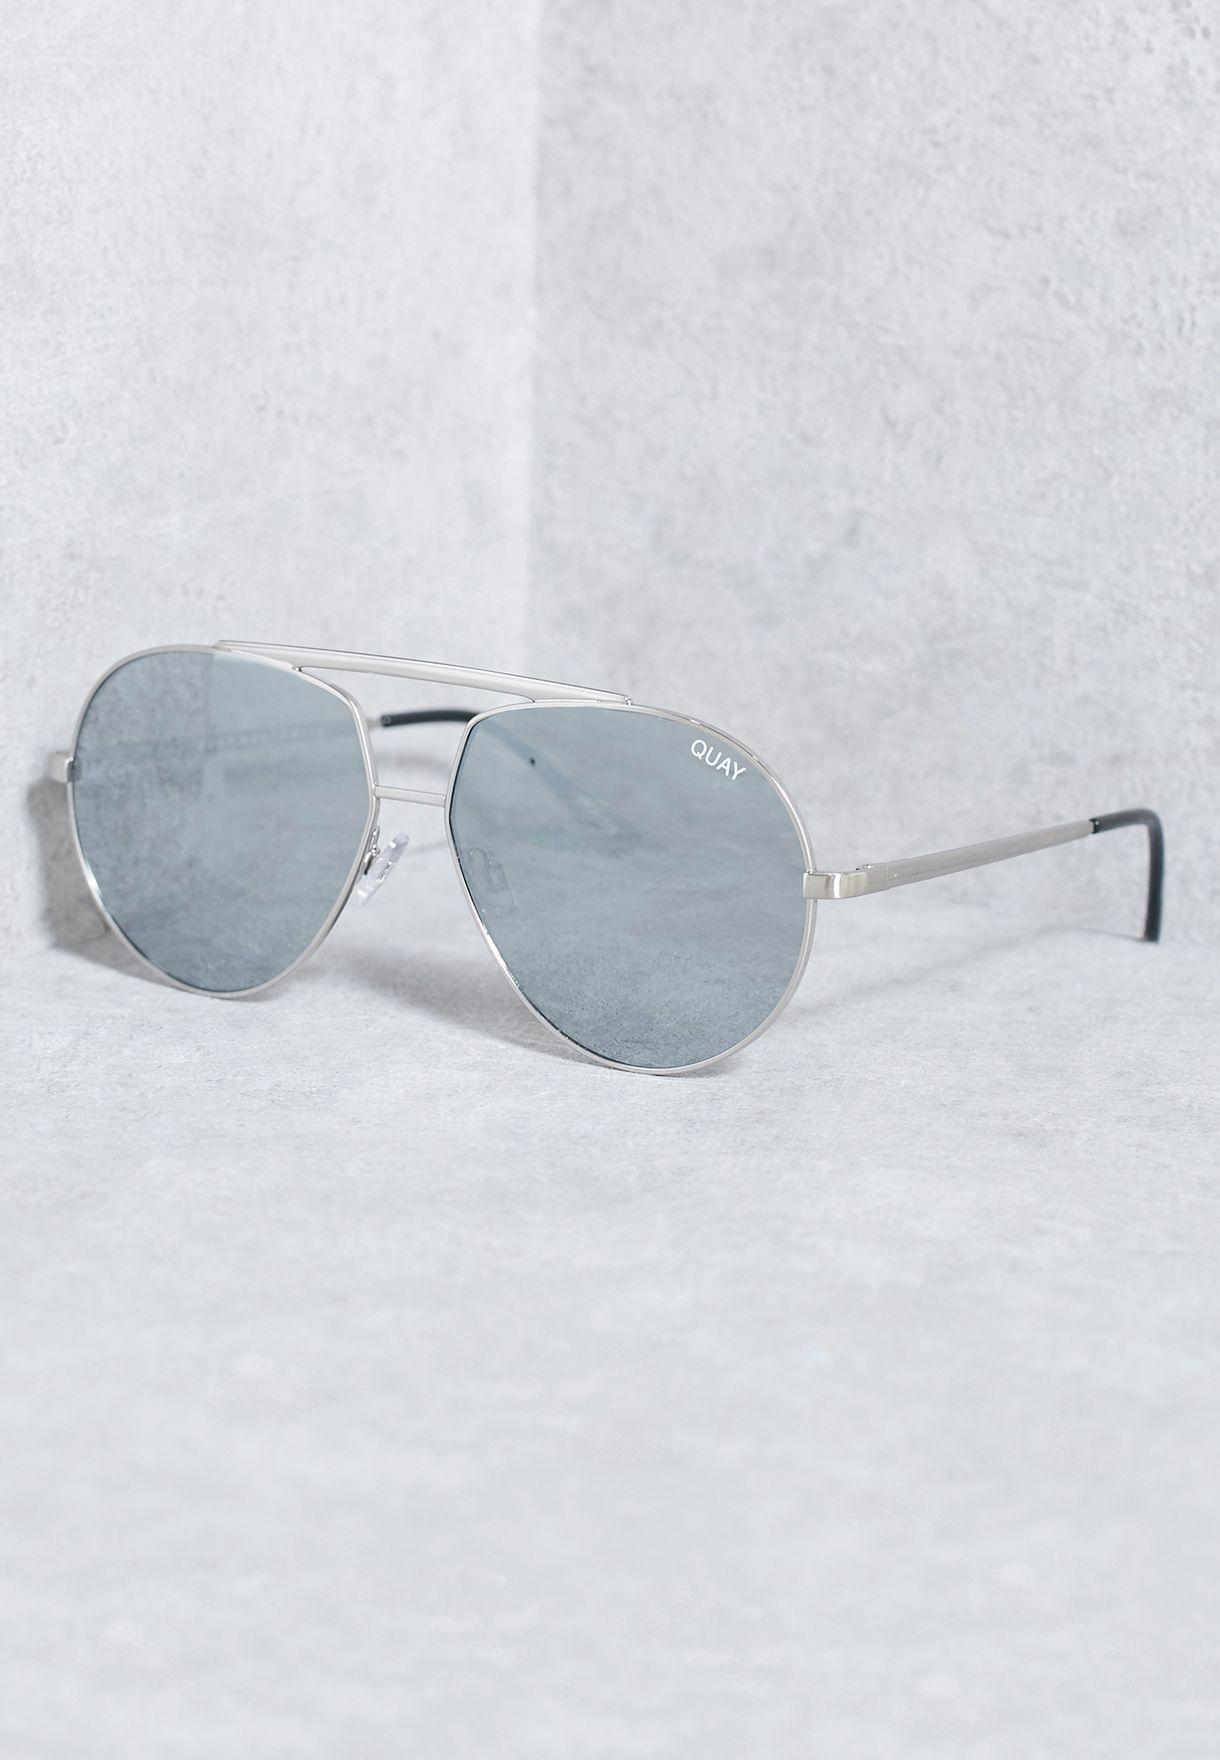 40ceaff7d6 Shop Quay Australia silver Blaze Sunglasses QM-000193 for Men in Bahrain -  QU896AC67YCQ